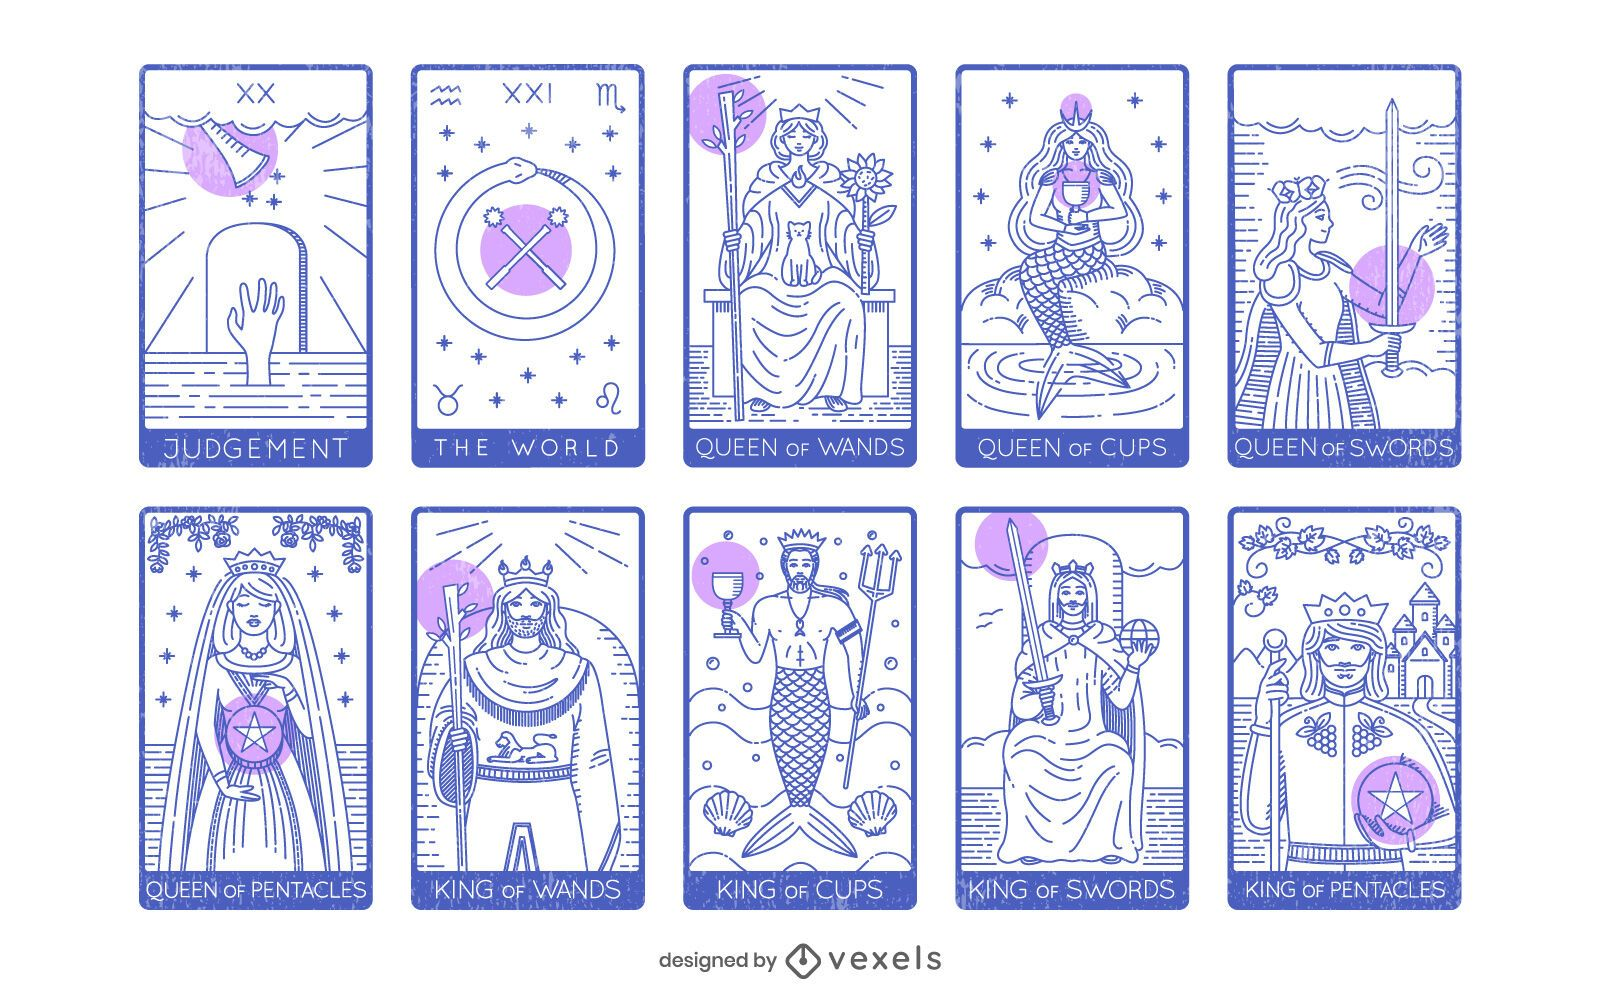 Pacote de cartas de tarô Arcanos Maiores e Menores